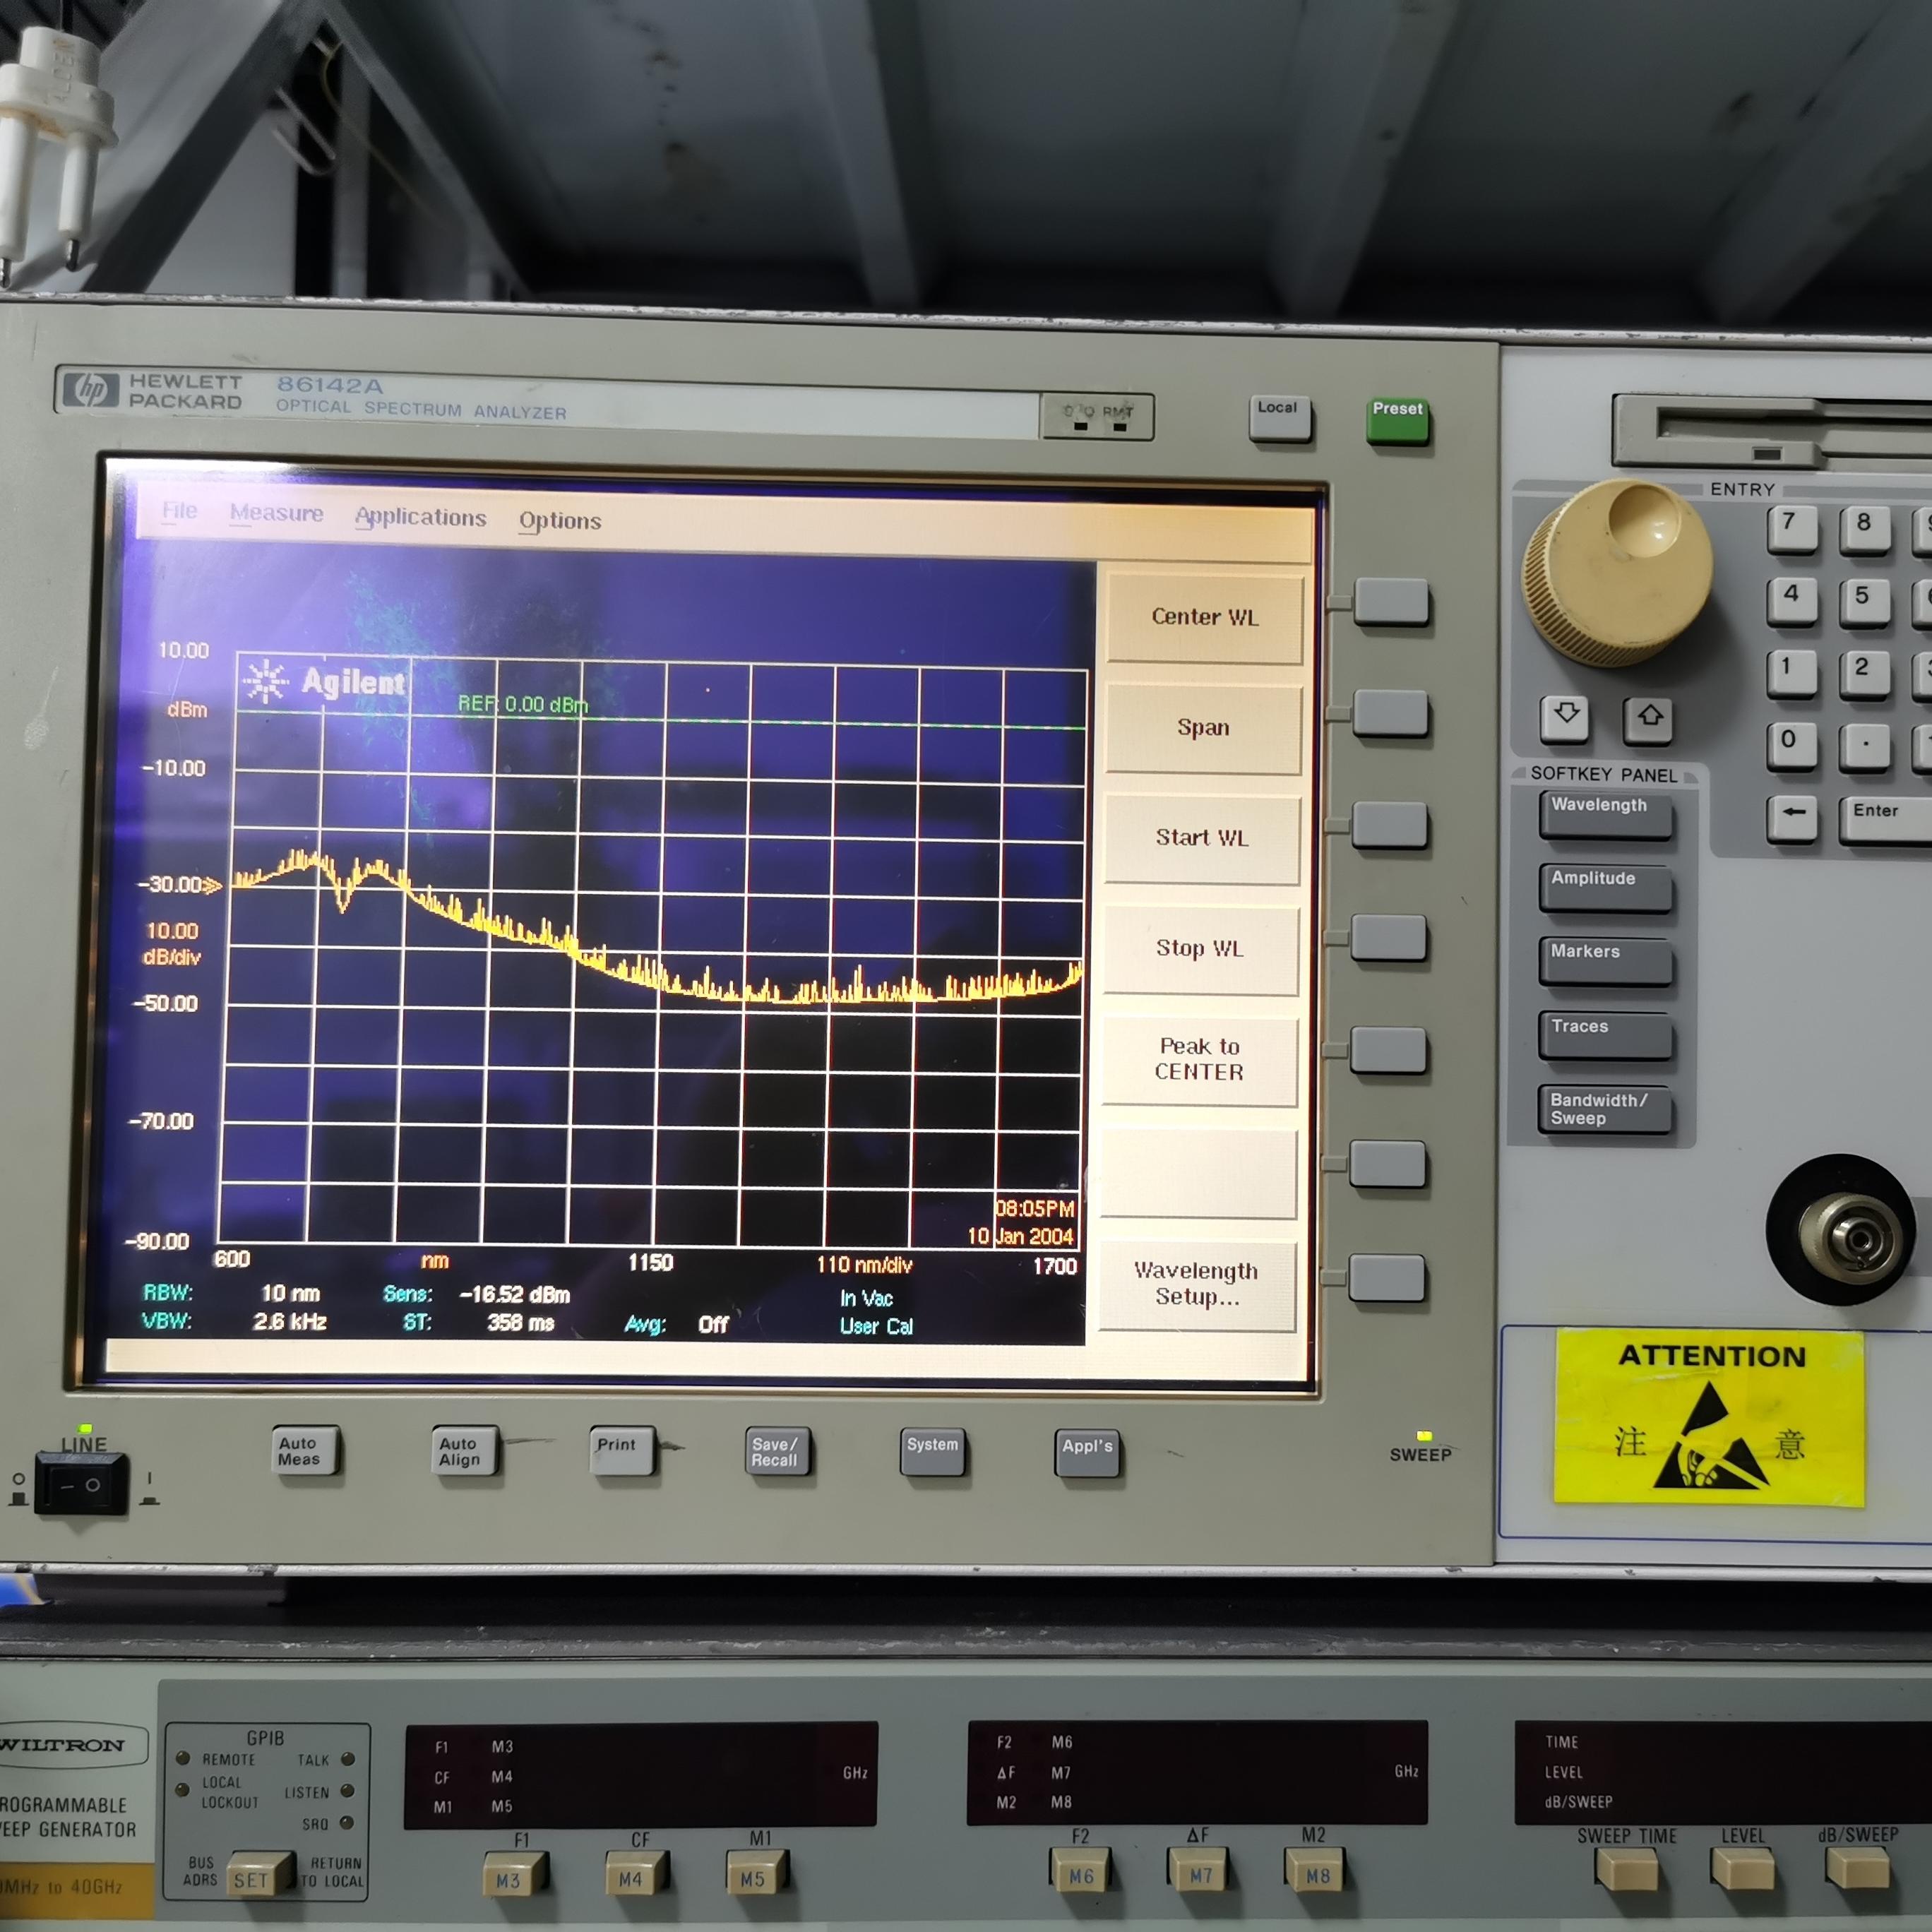 86142B光谱分析仪86142B安捷伦Agilent维修